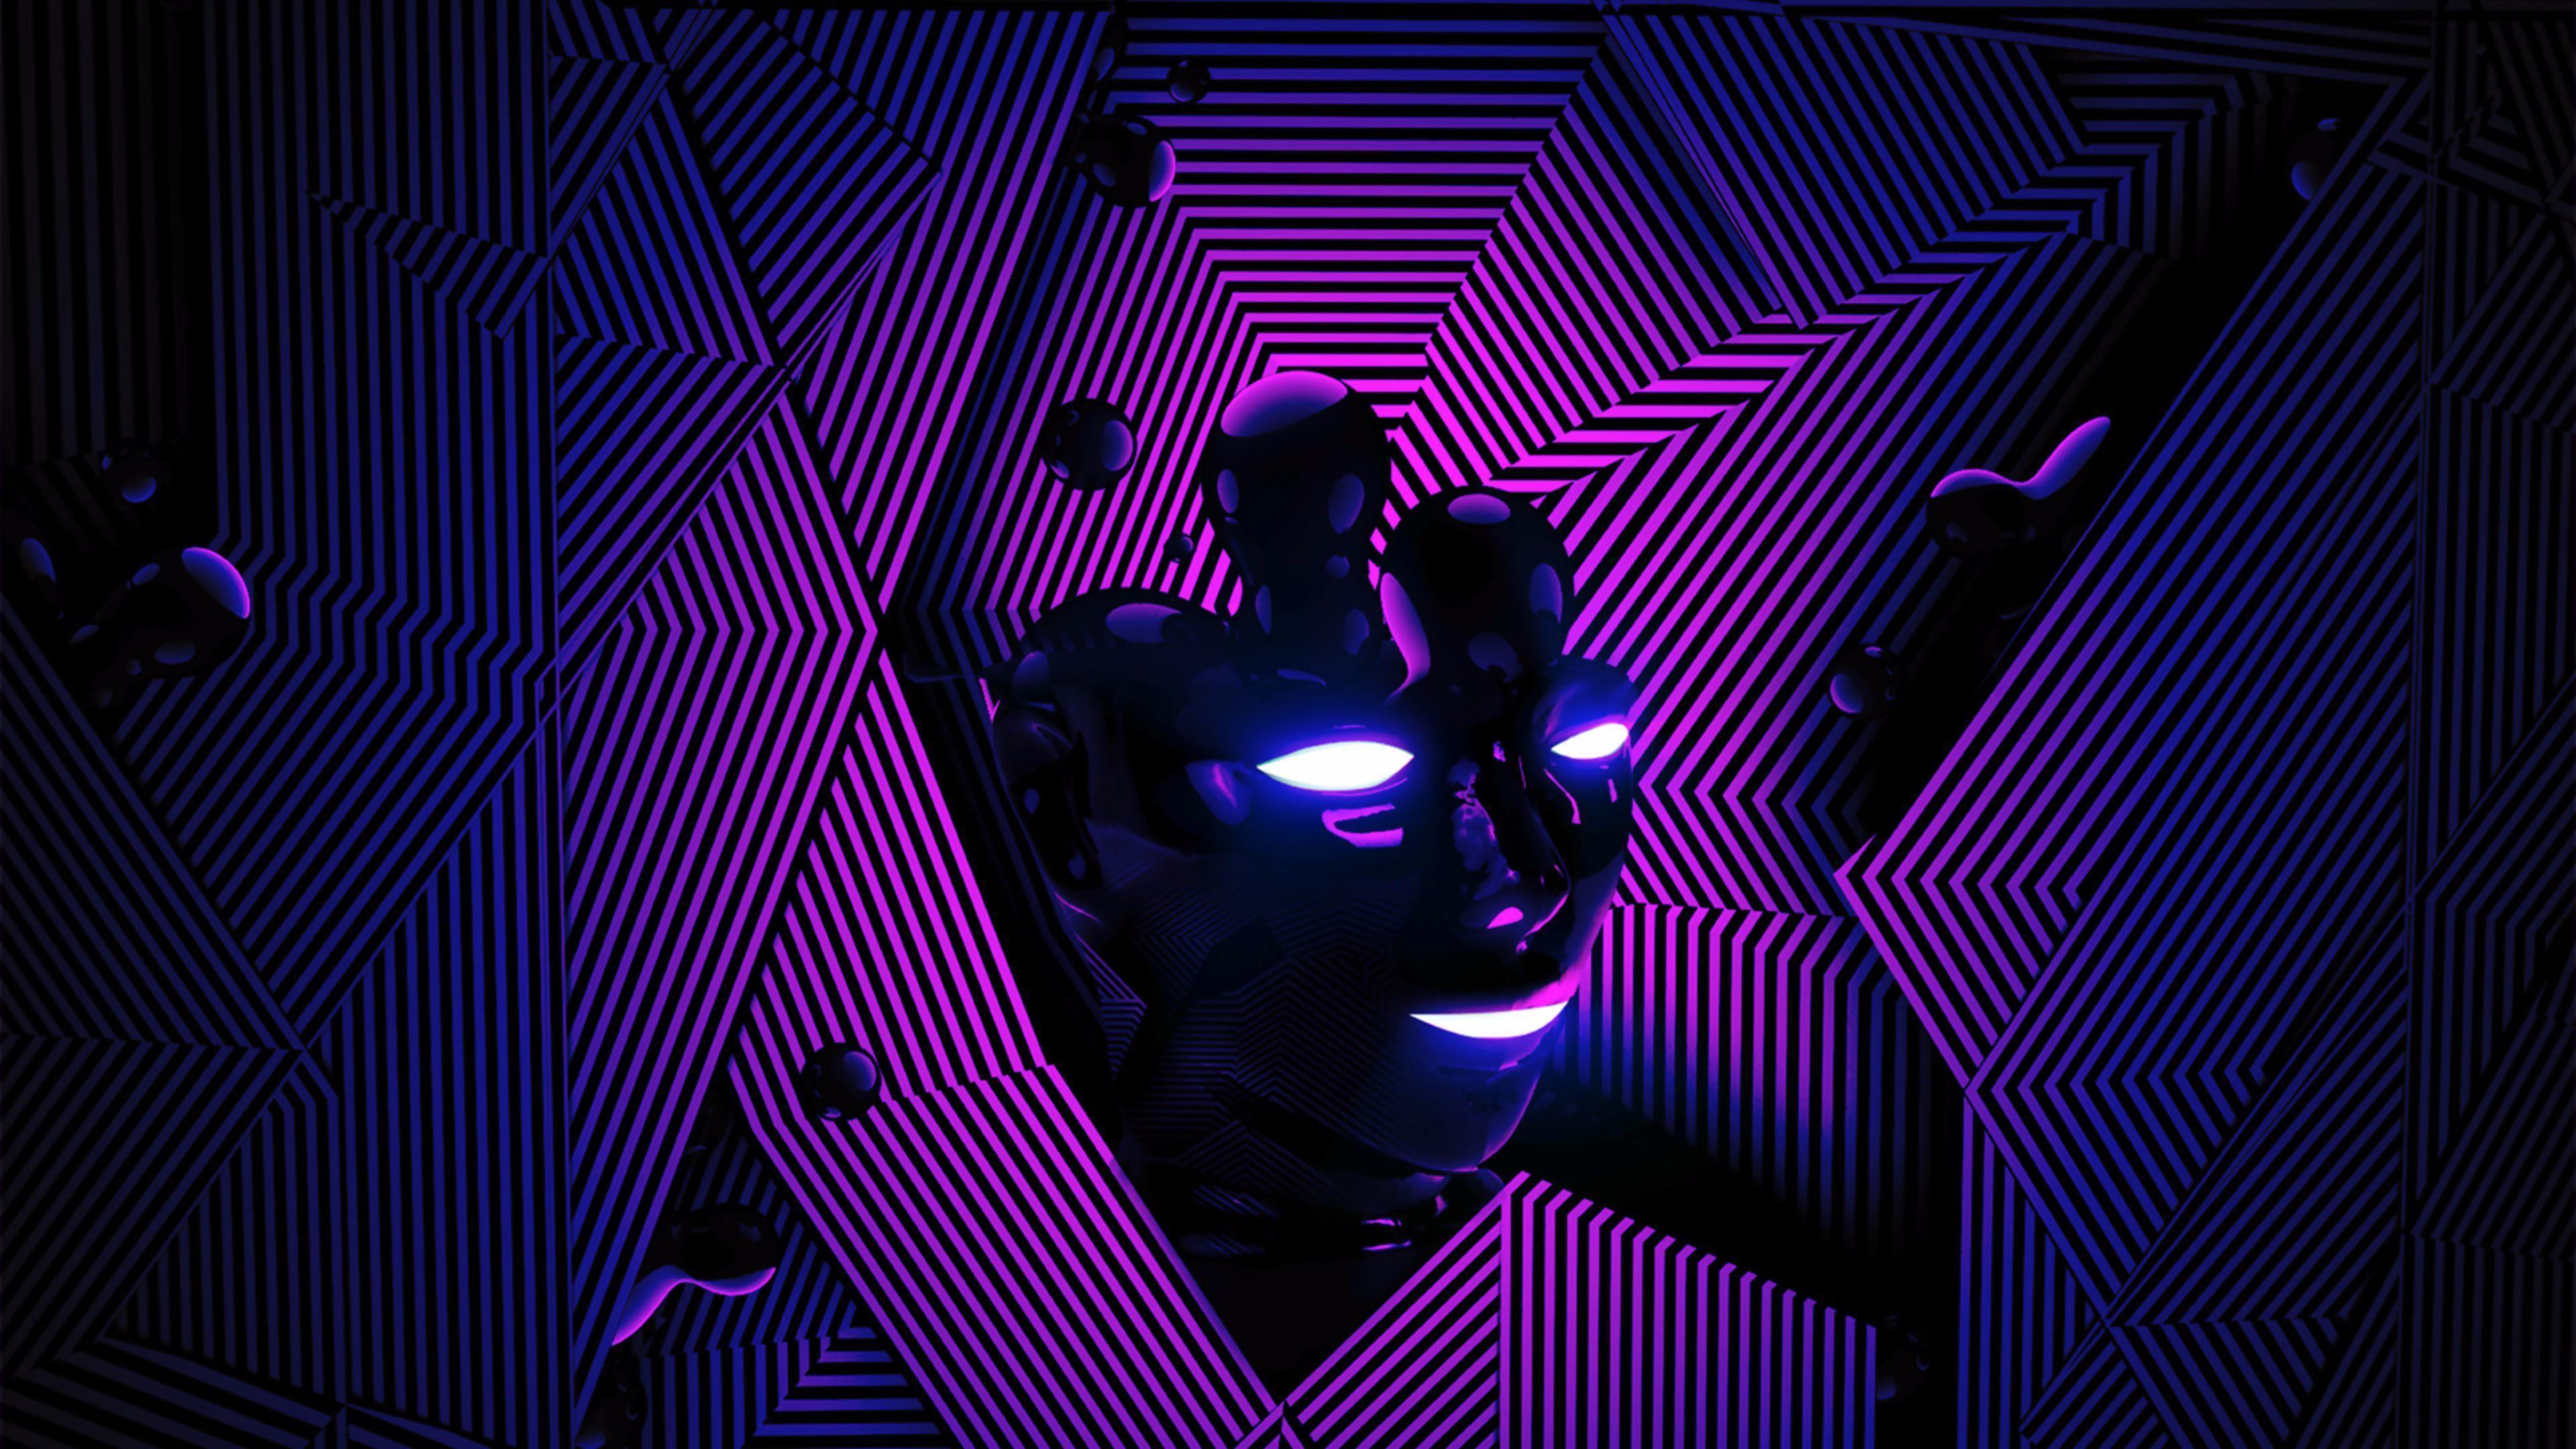 Purple PC Wallpapers - Top Free Purple